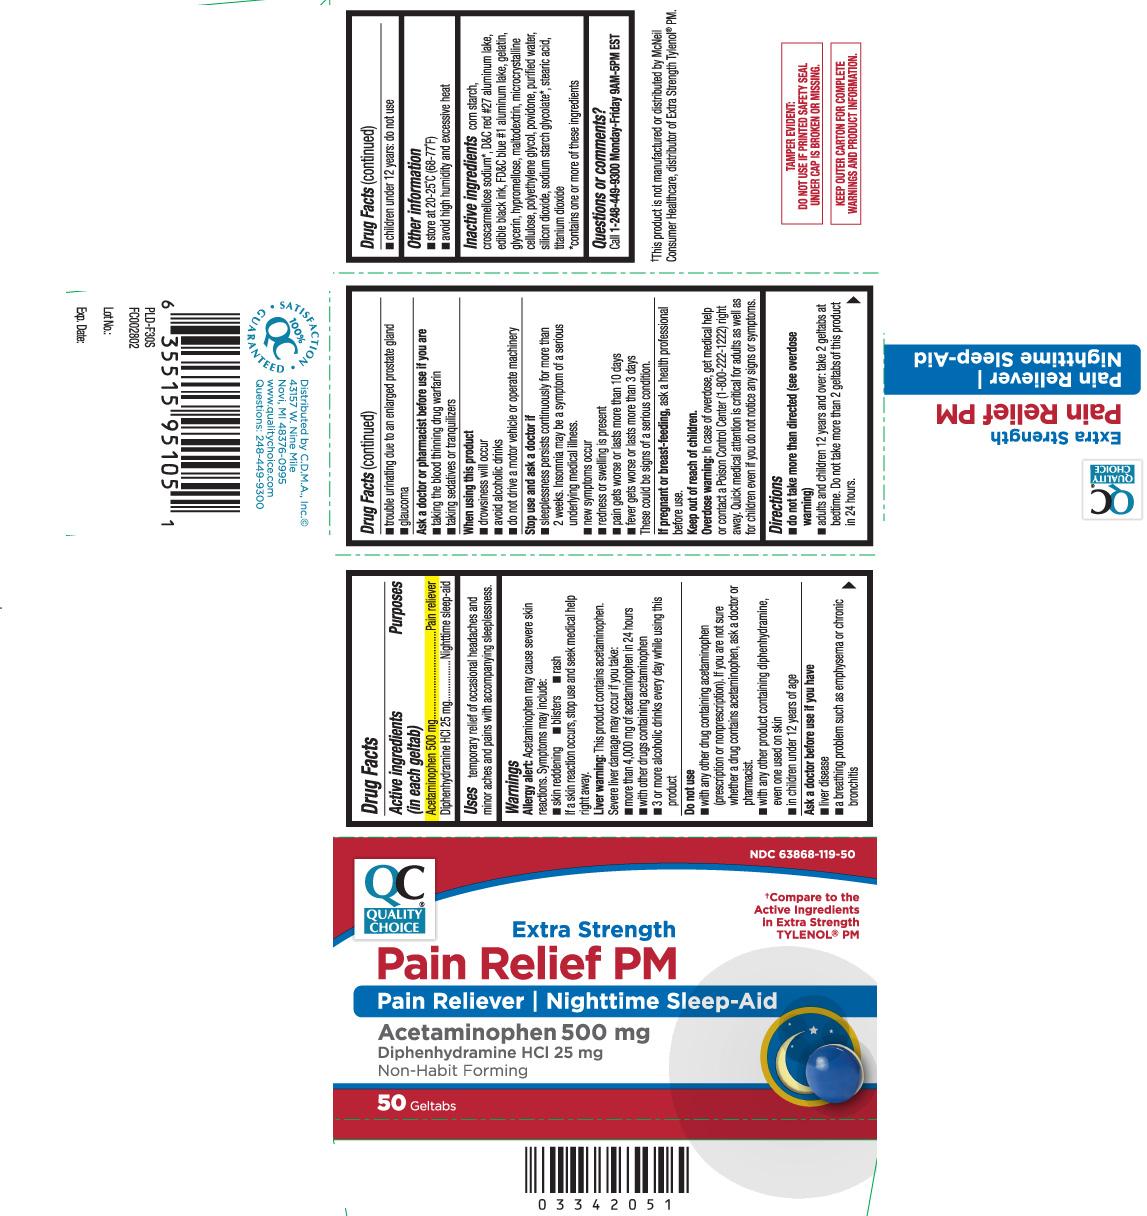 Acetaminophen 500mg Diphenhydramine HCI 25mg